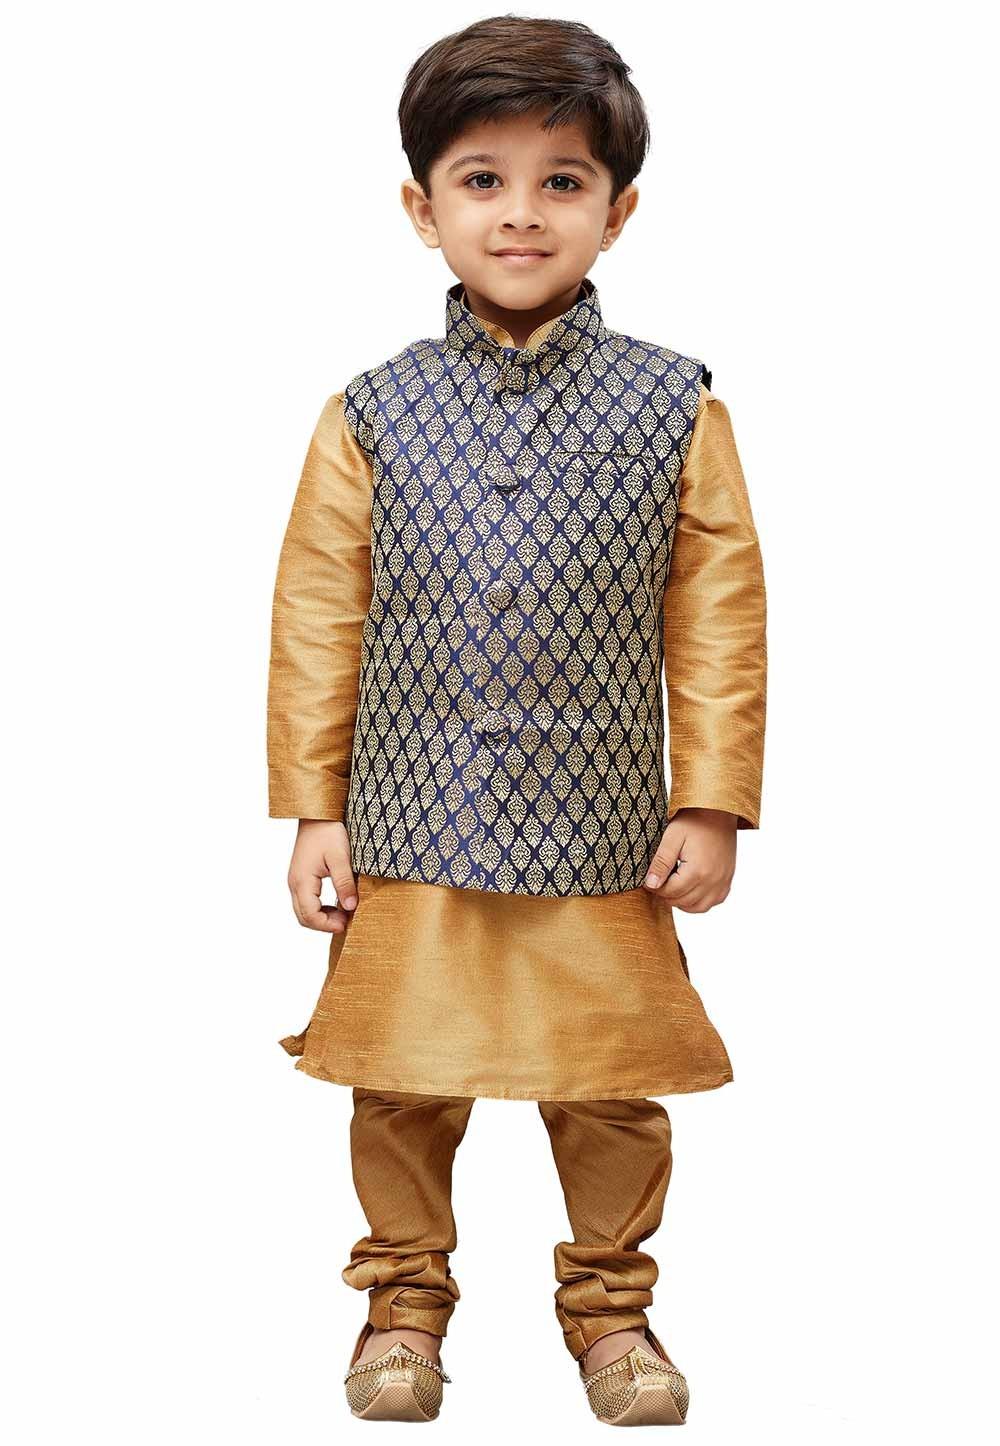 Golden,Blue Colour Boy's Party Wear Kurta Pajama